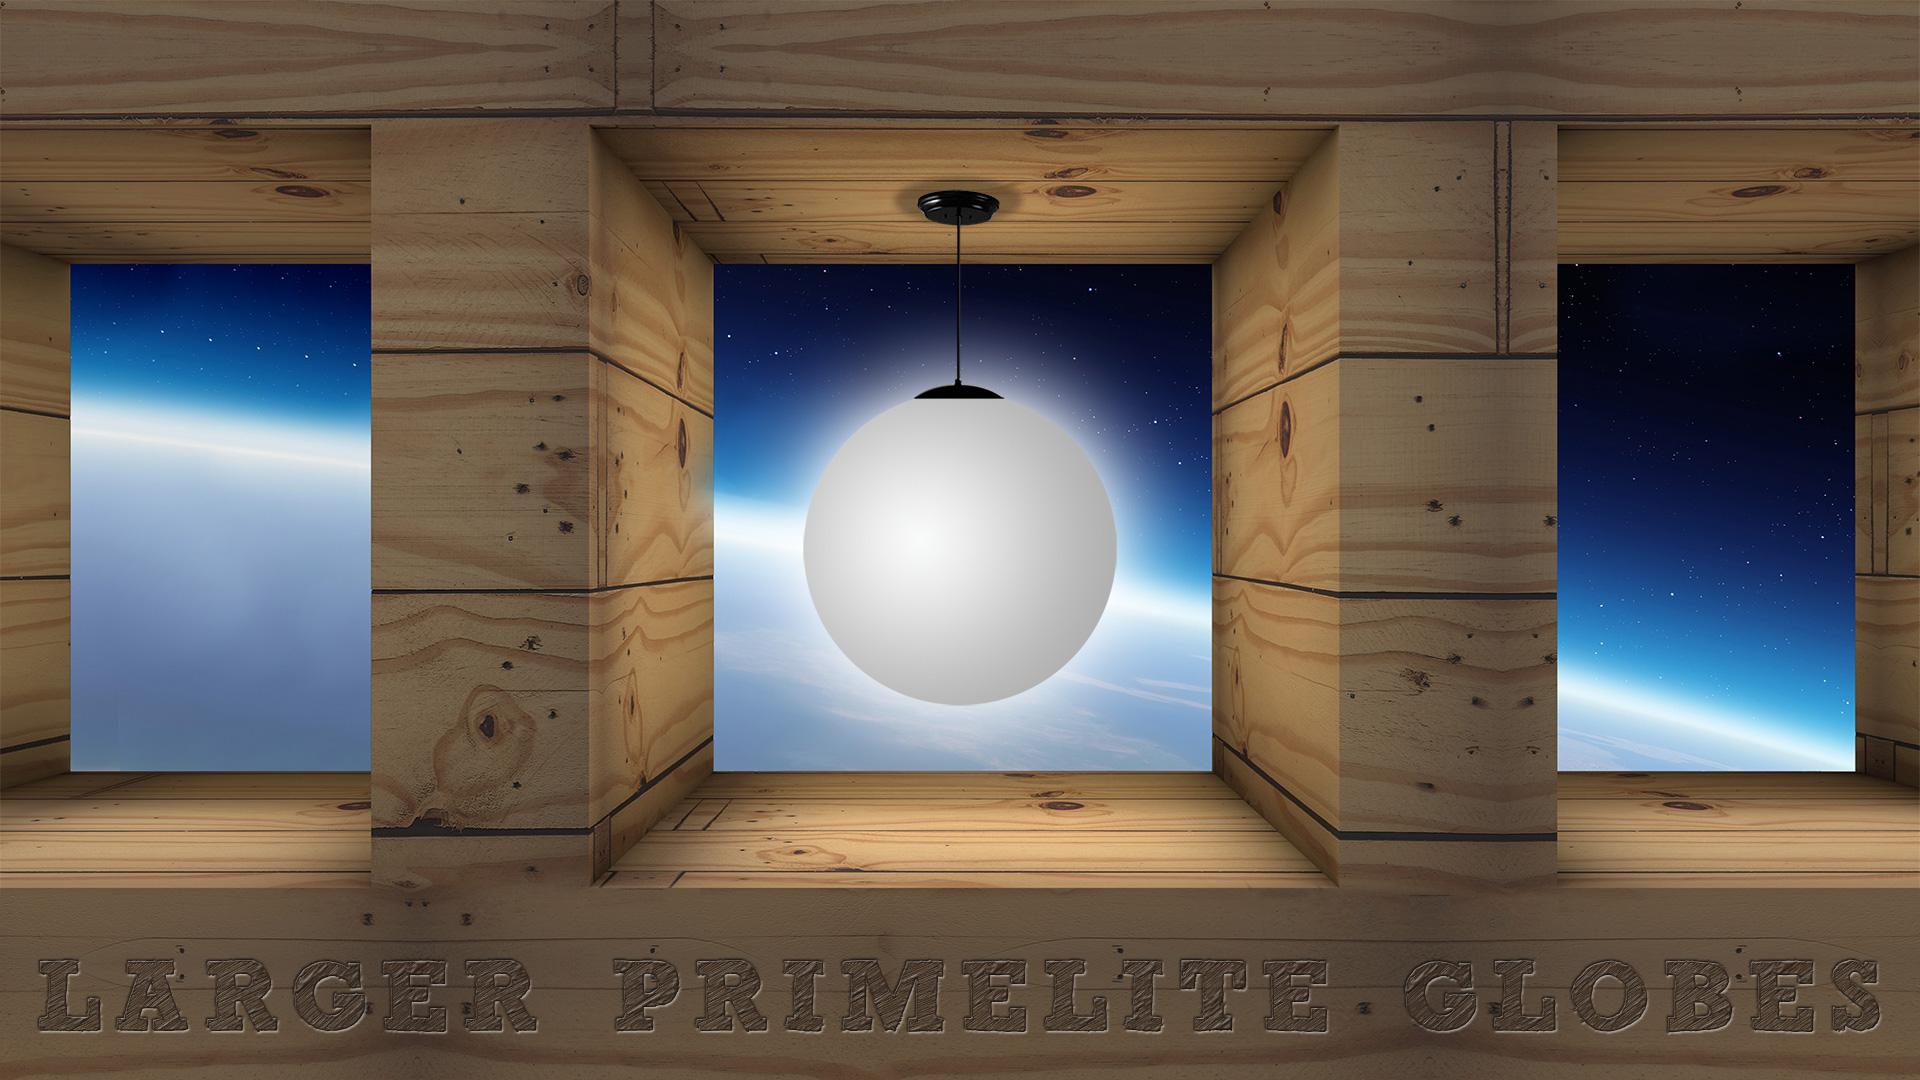 Primelite Mfg - Website, Blog & Social Media Graphic